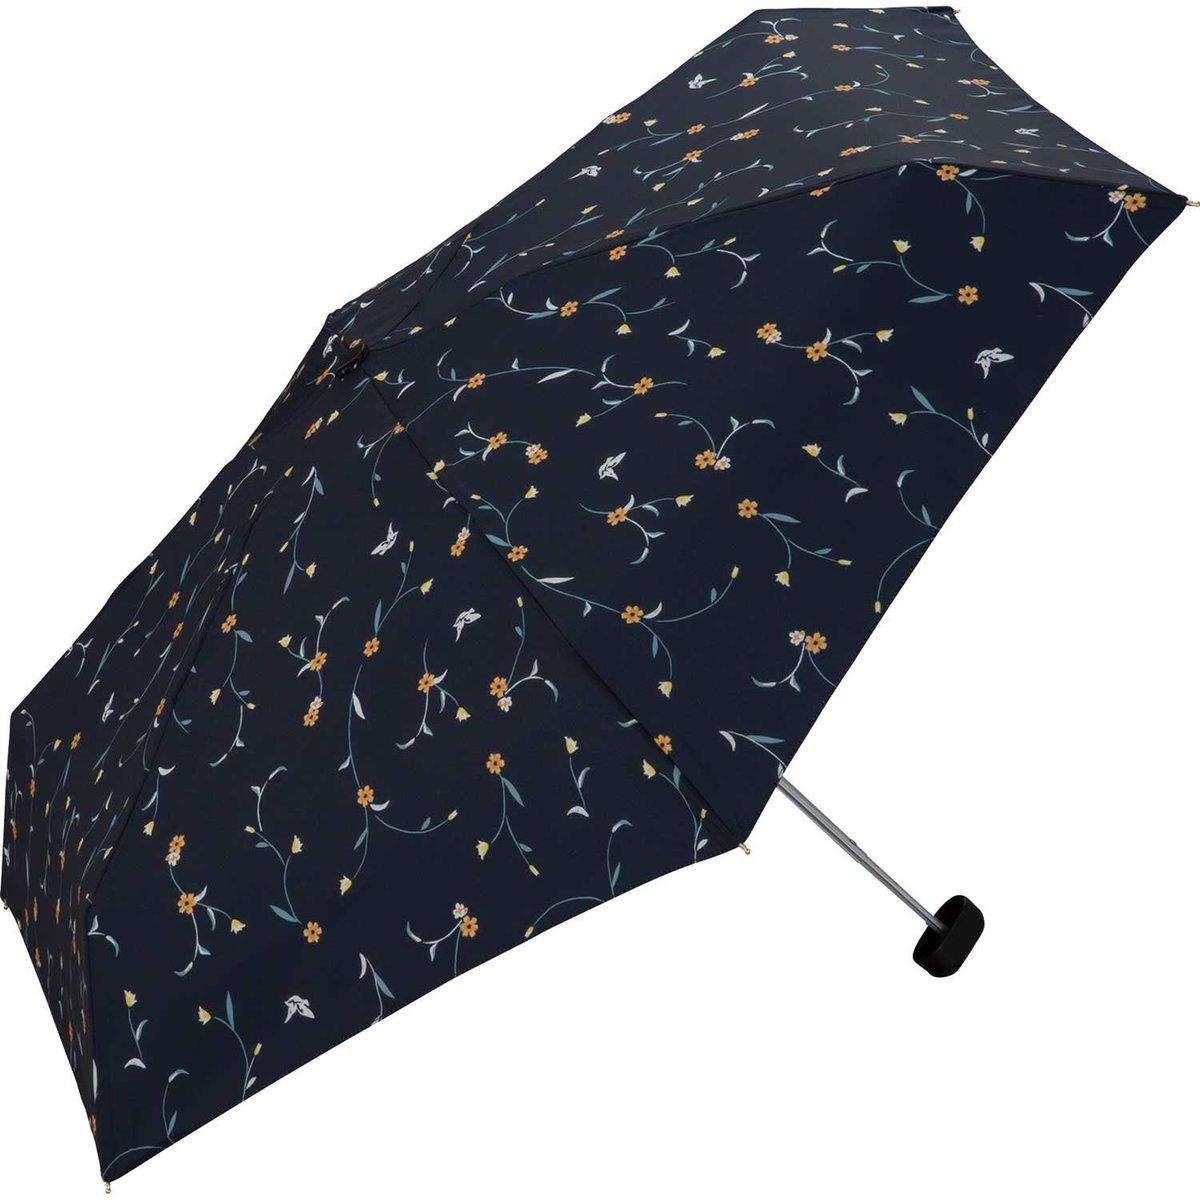 Mini Umbrella‧Anti-UV‧6076 Folding umbrella - Navy